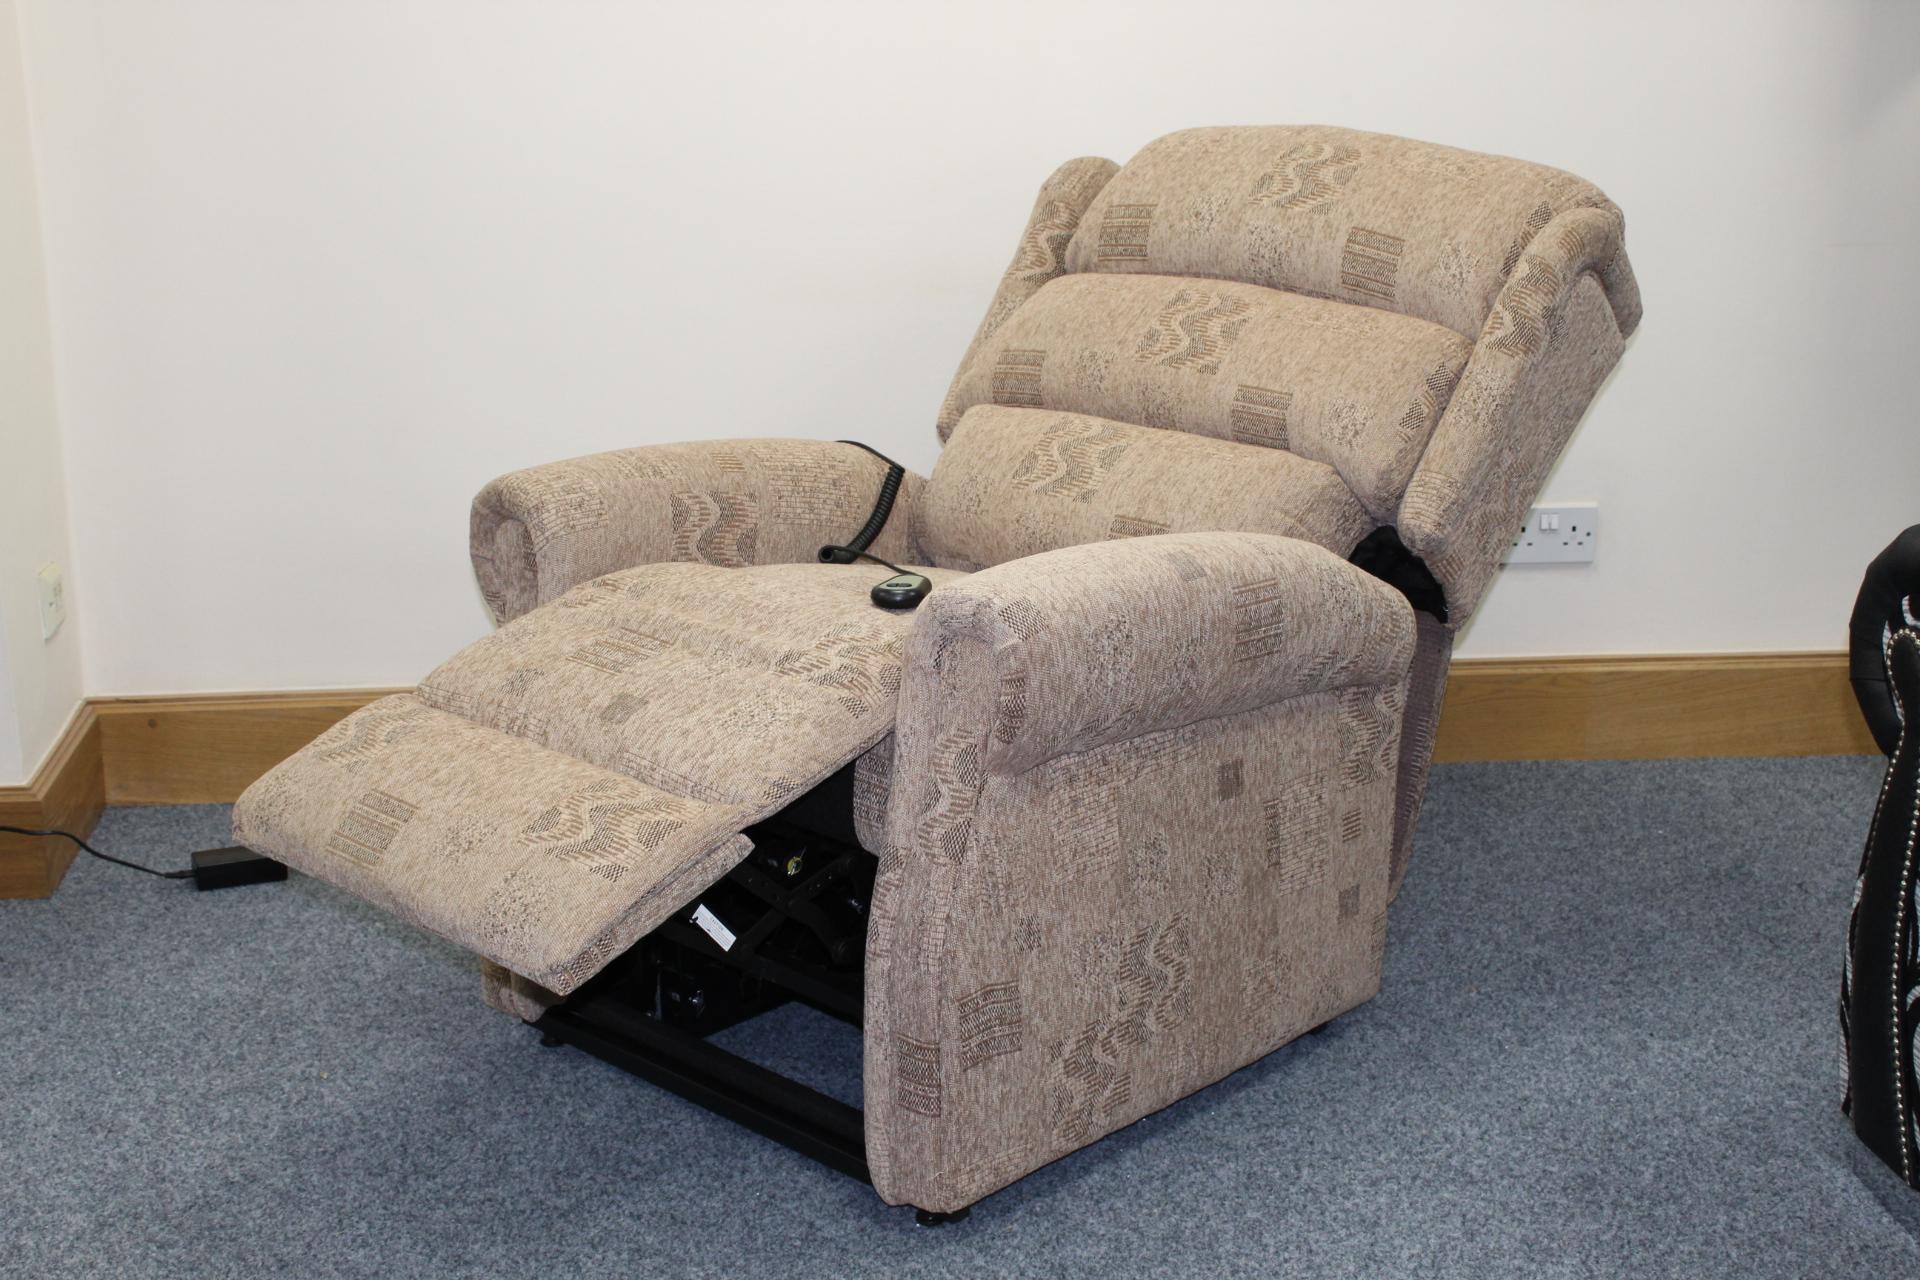 Rise Amp Recline Electric Recliner Chair Shipcote Furniture